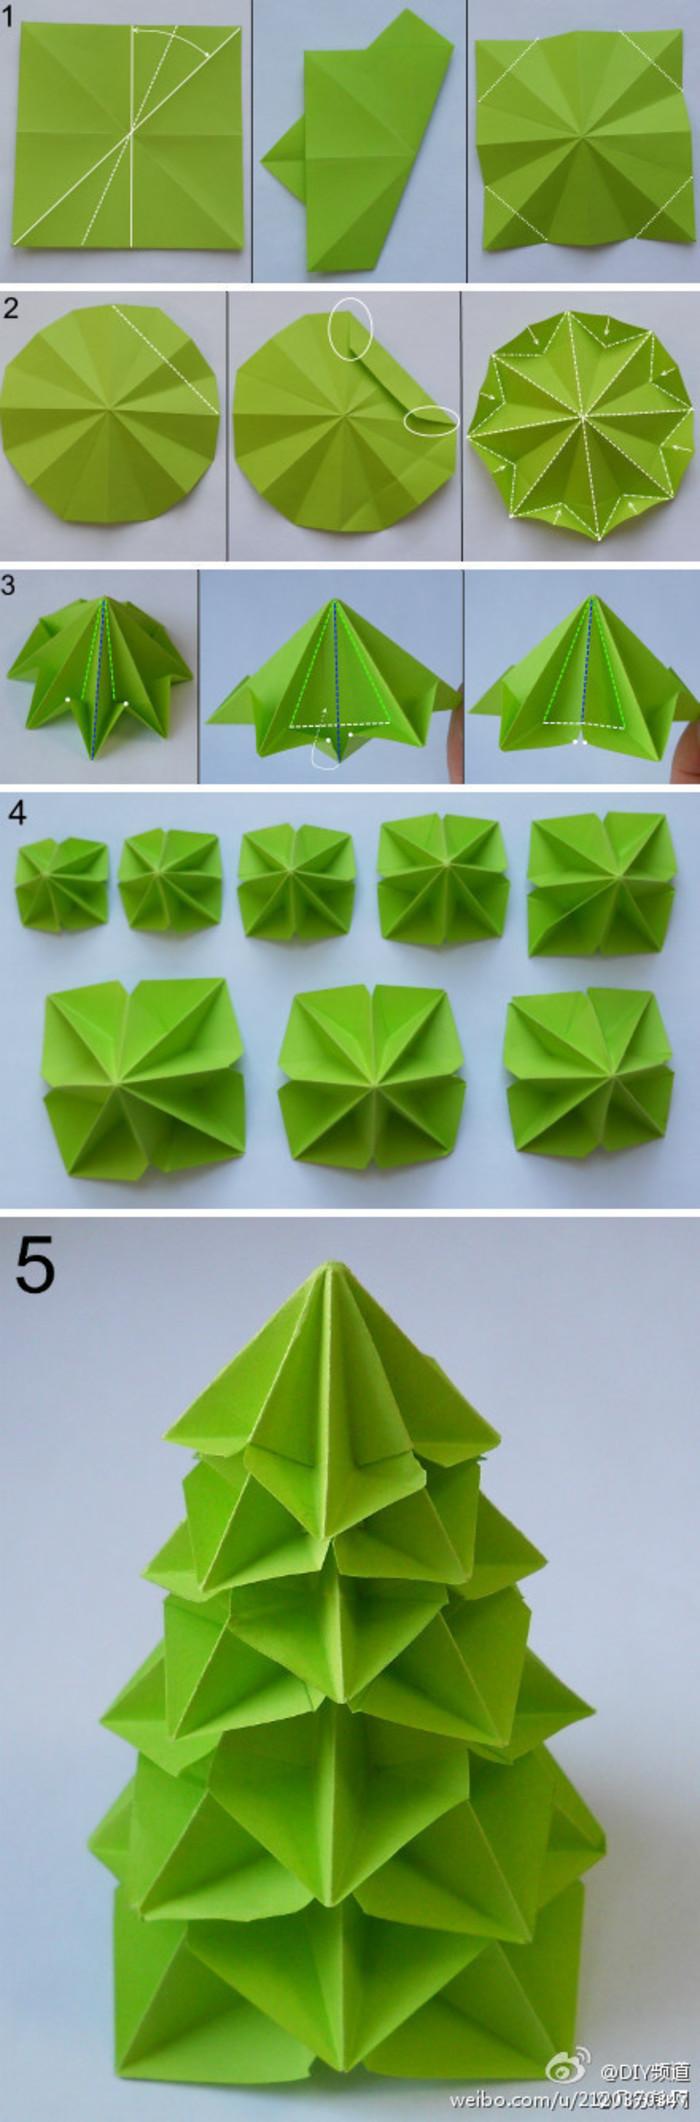 origami modular christmas tree folding instructions